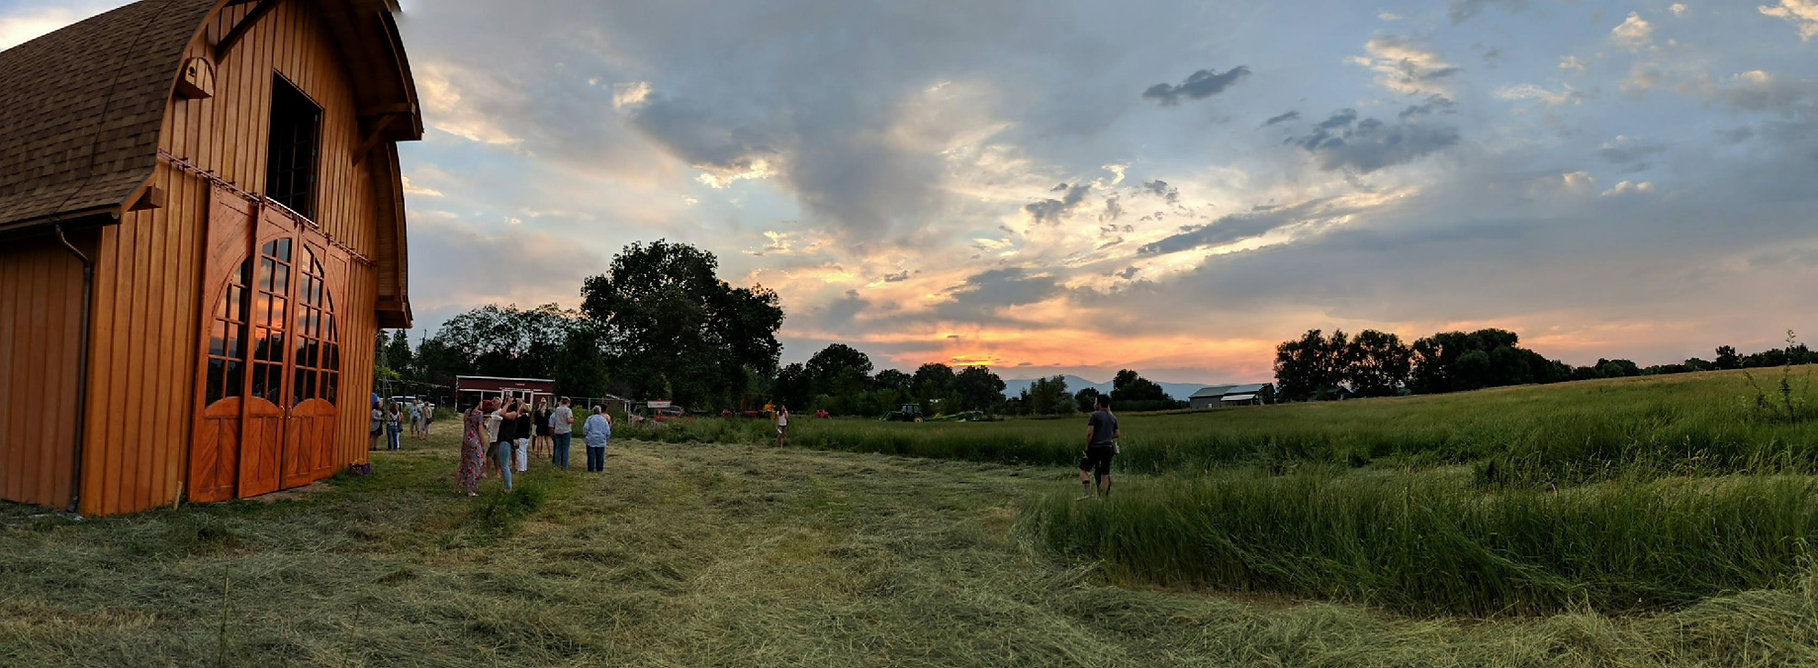 FCMF 2018 Barn (Landscape)_edited.jpg